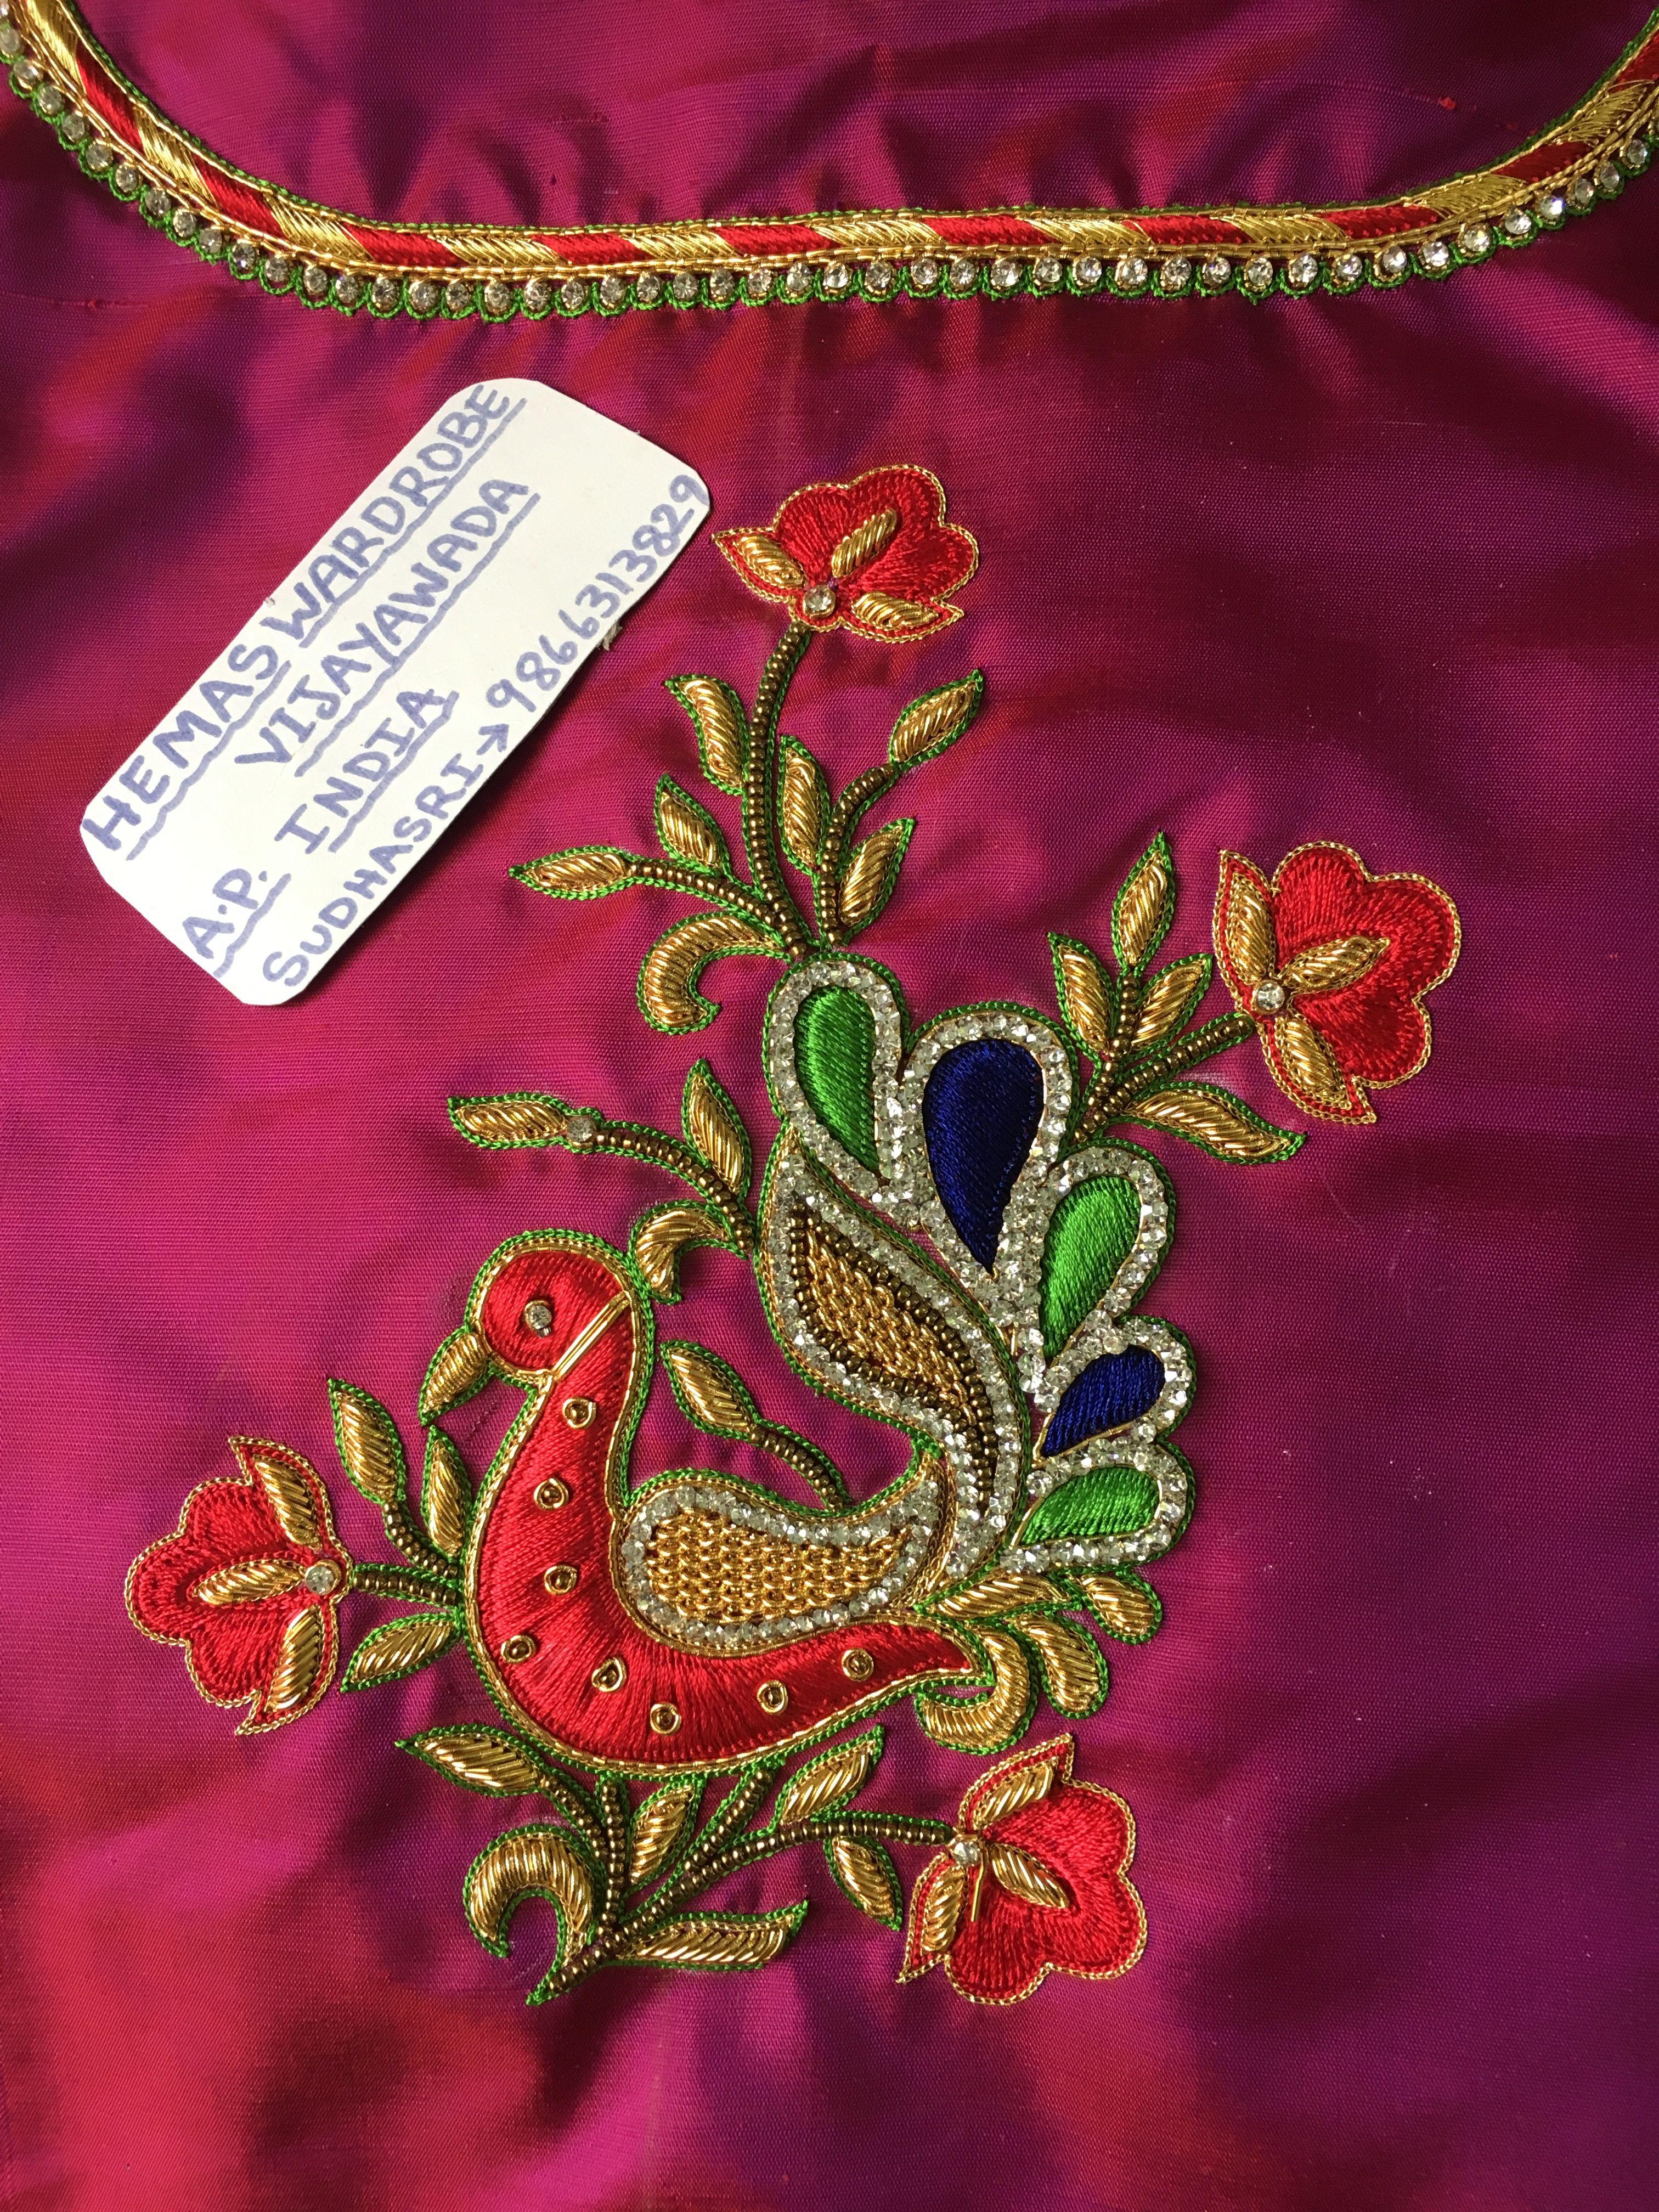 b9a1bf3113420c Sudhasri hemaswardrobe Zardosi Embroidery